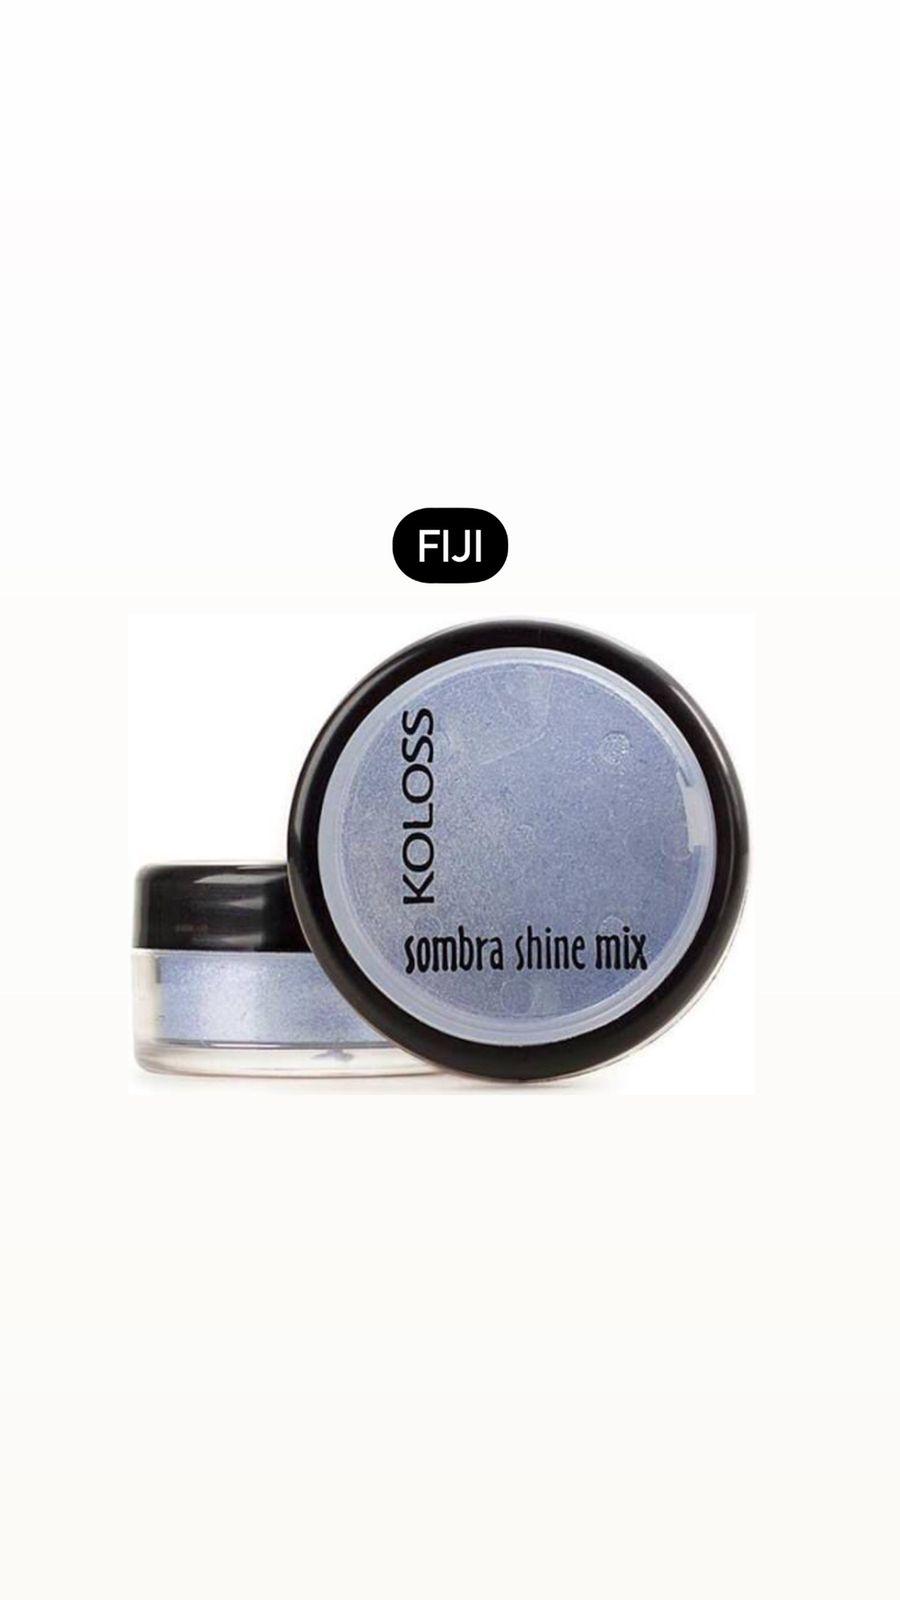 sombra shine mix koloss